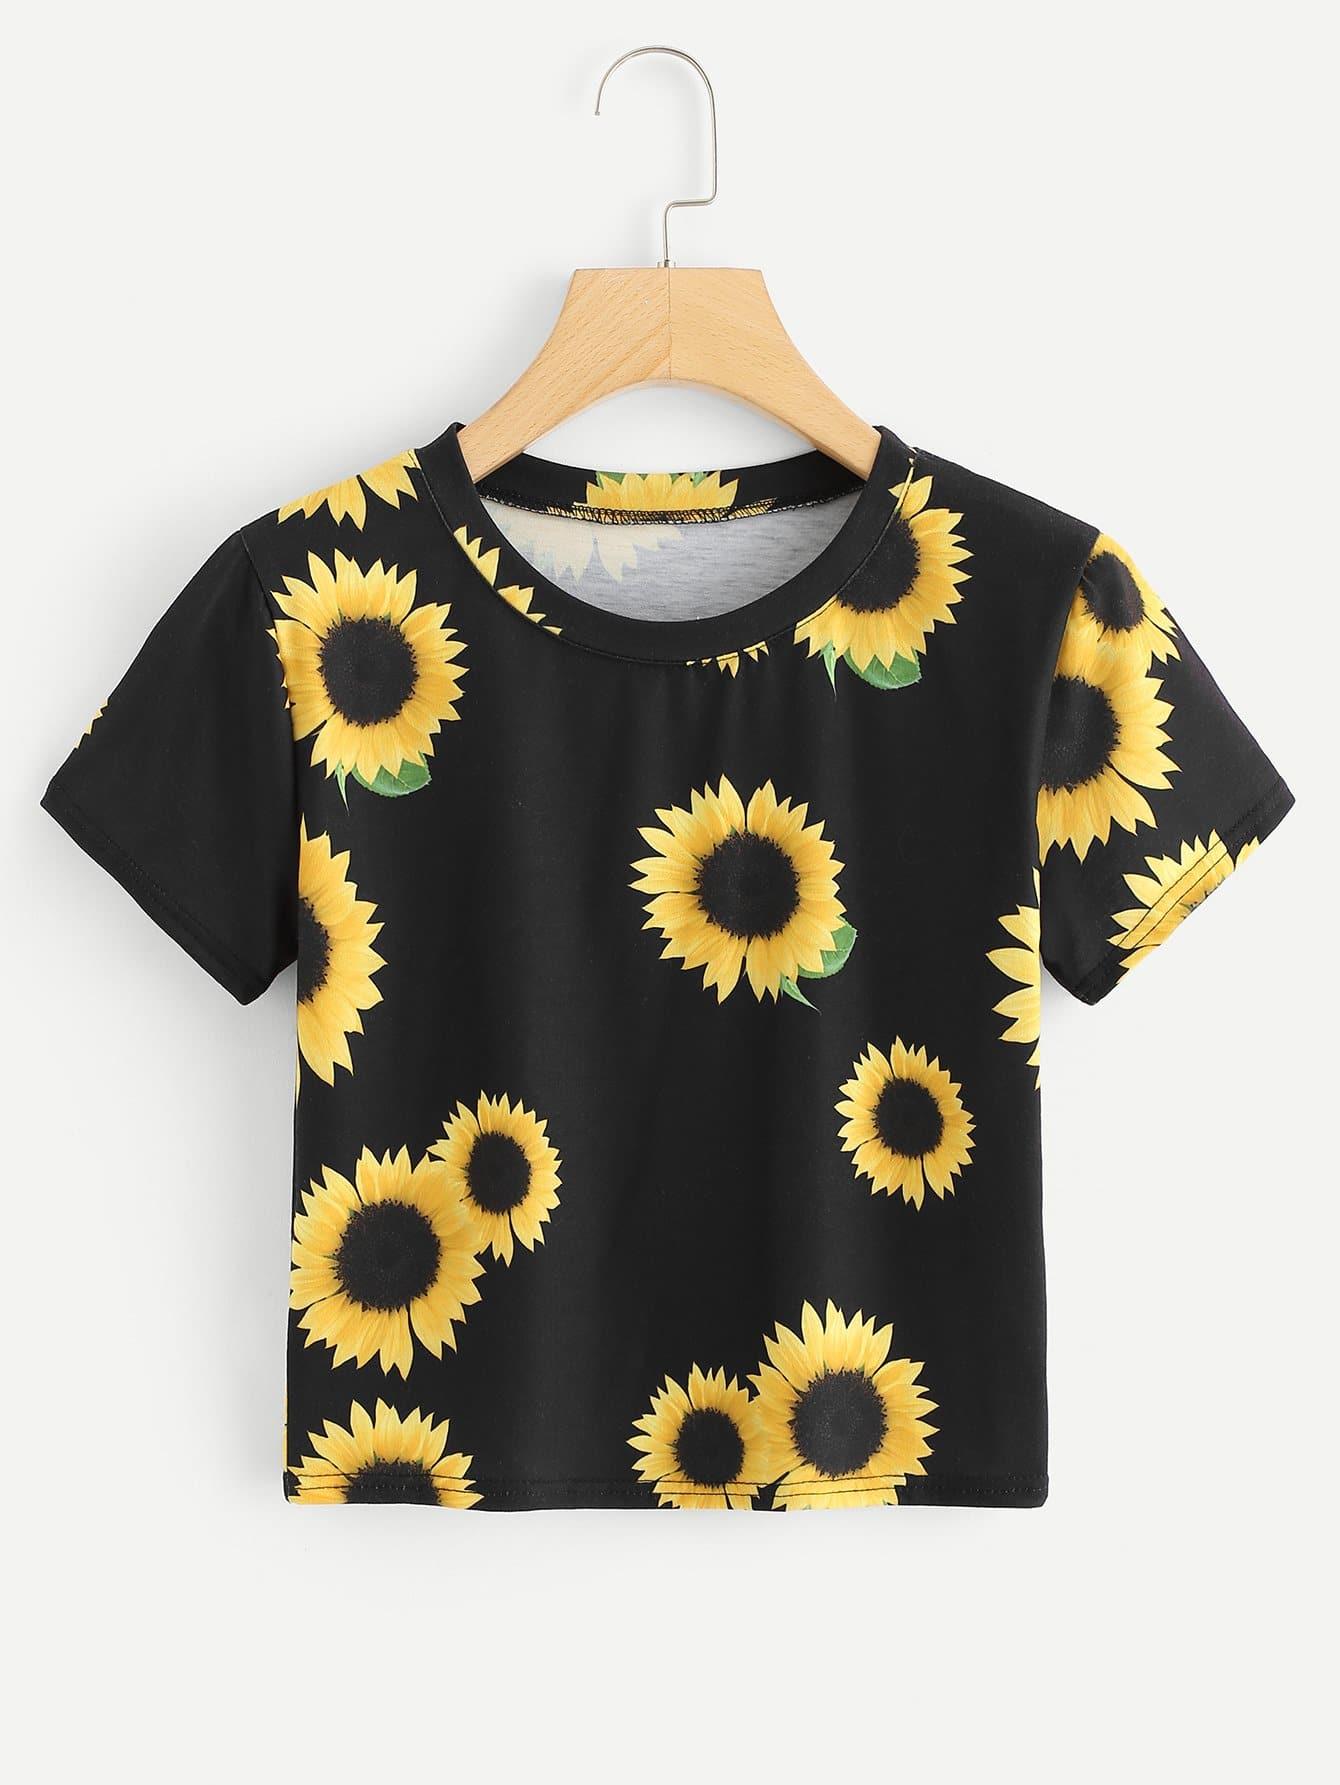 Sunflower Print Crop Tee sunflower print crop tee